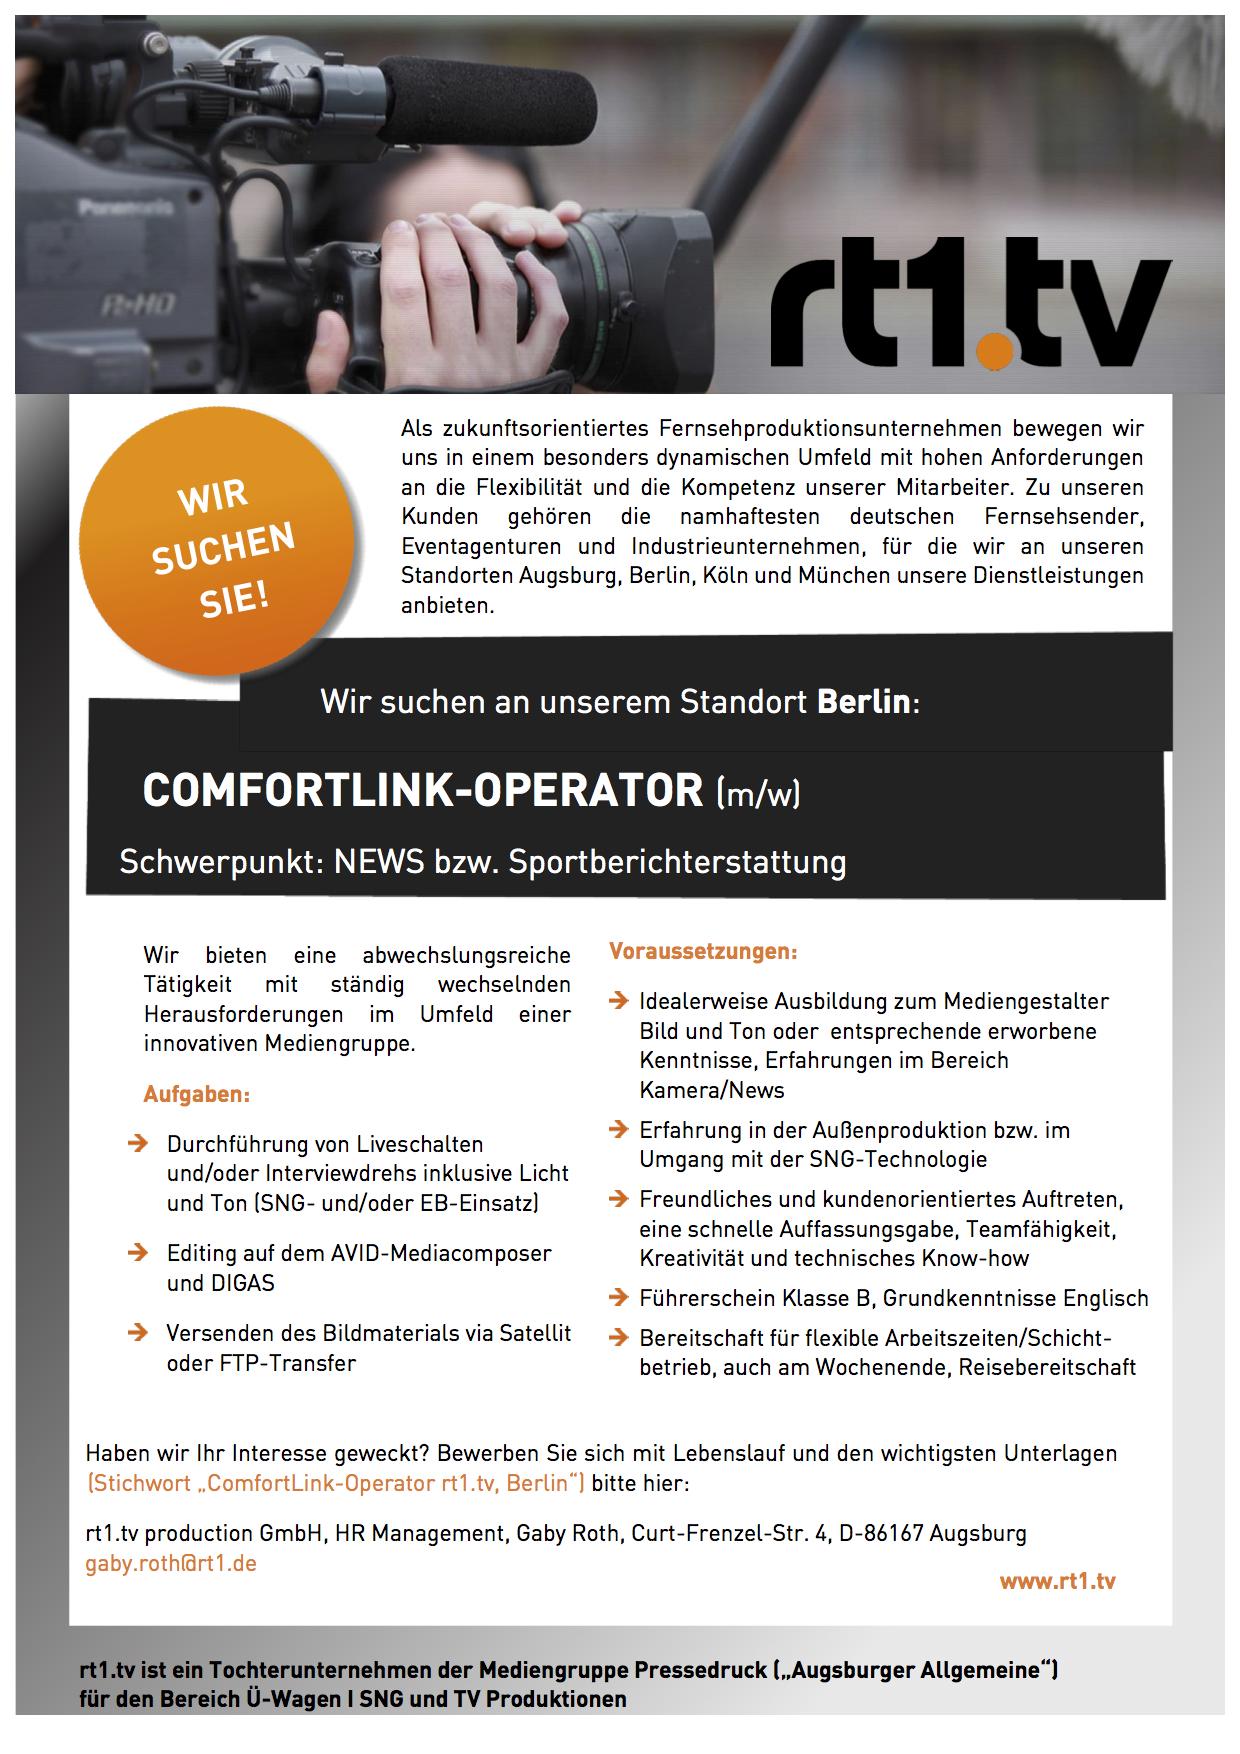 Comfortlink-Operator (m/w)